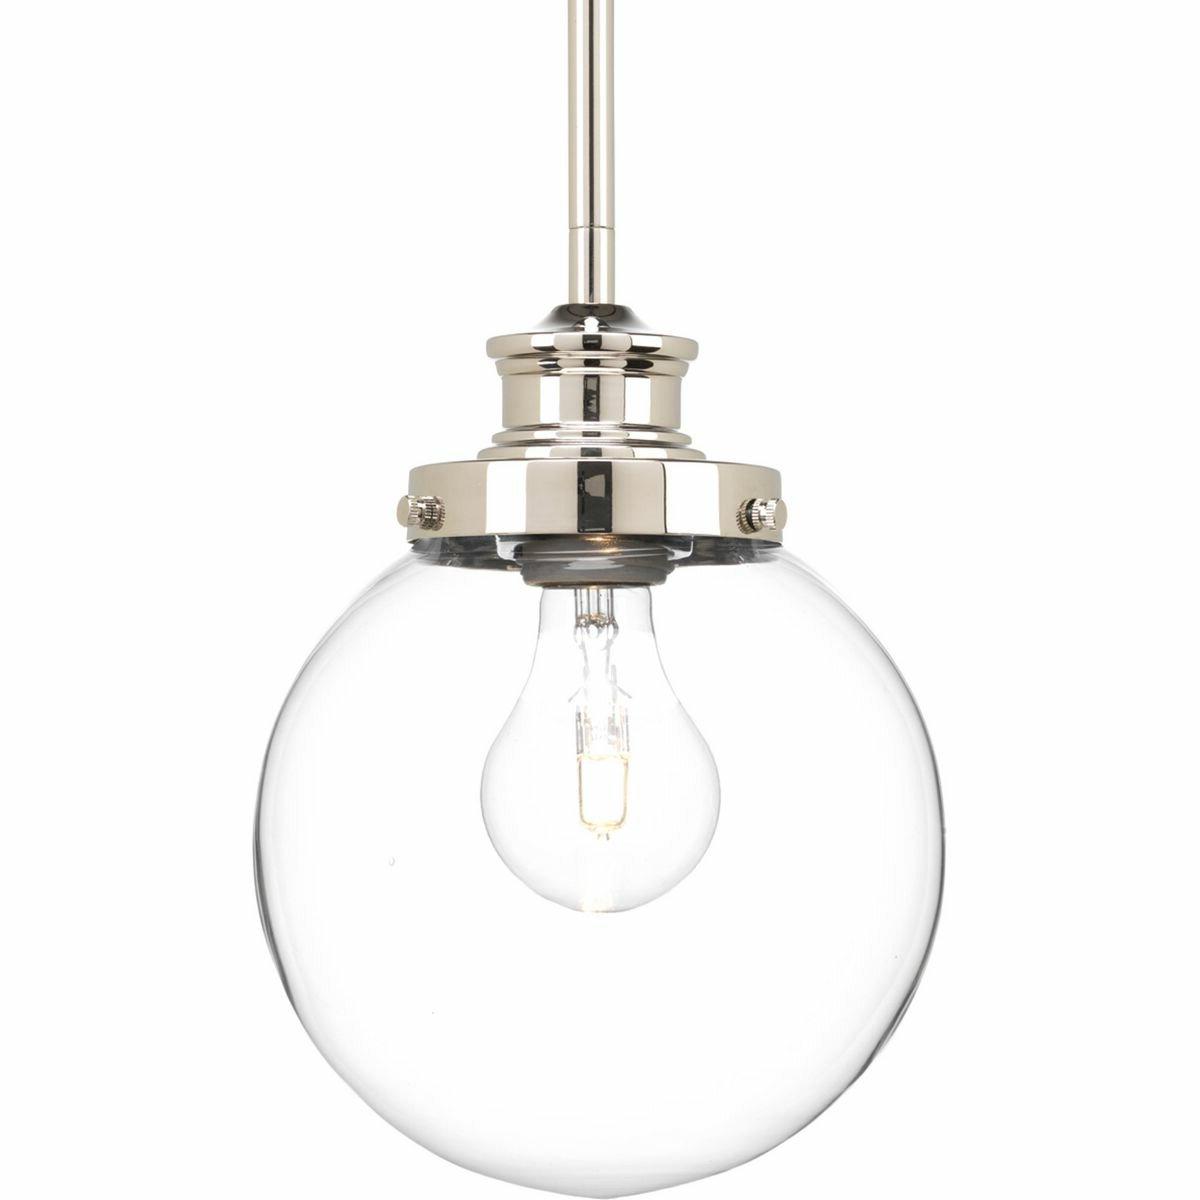 Well Known Bundy 1 Light Single Globe Pendants Intended For Cayden 1 Light Single Globe Pendant (View 12 of 20)